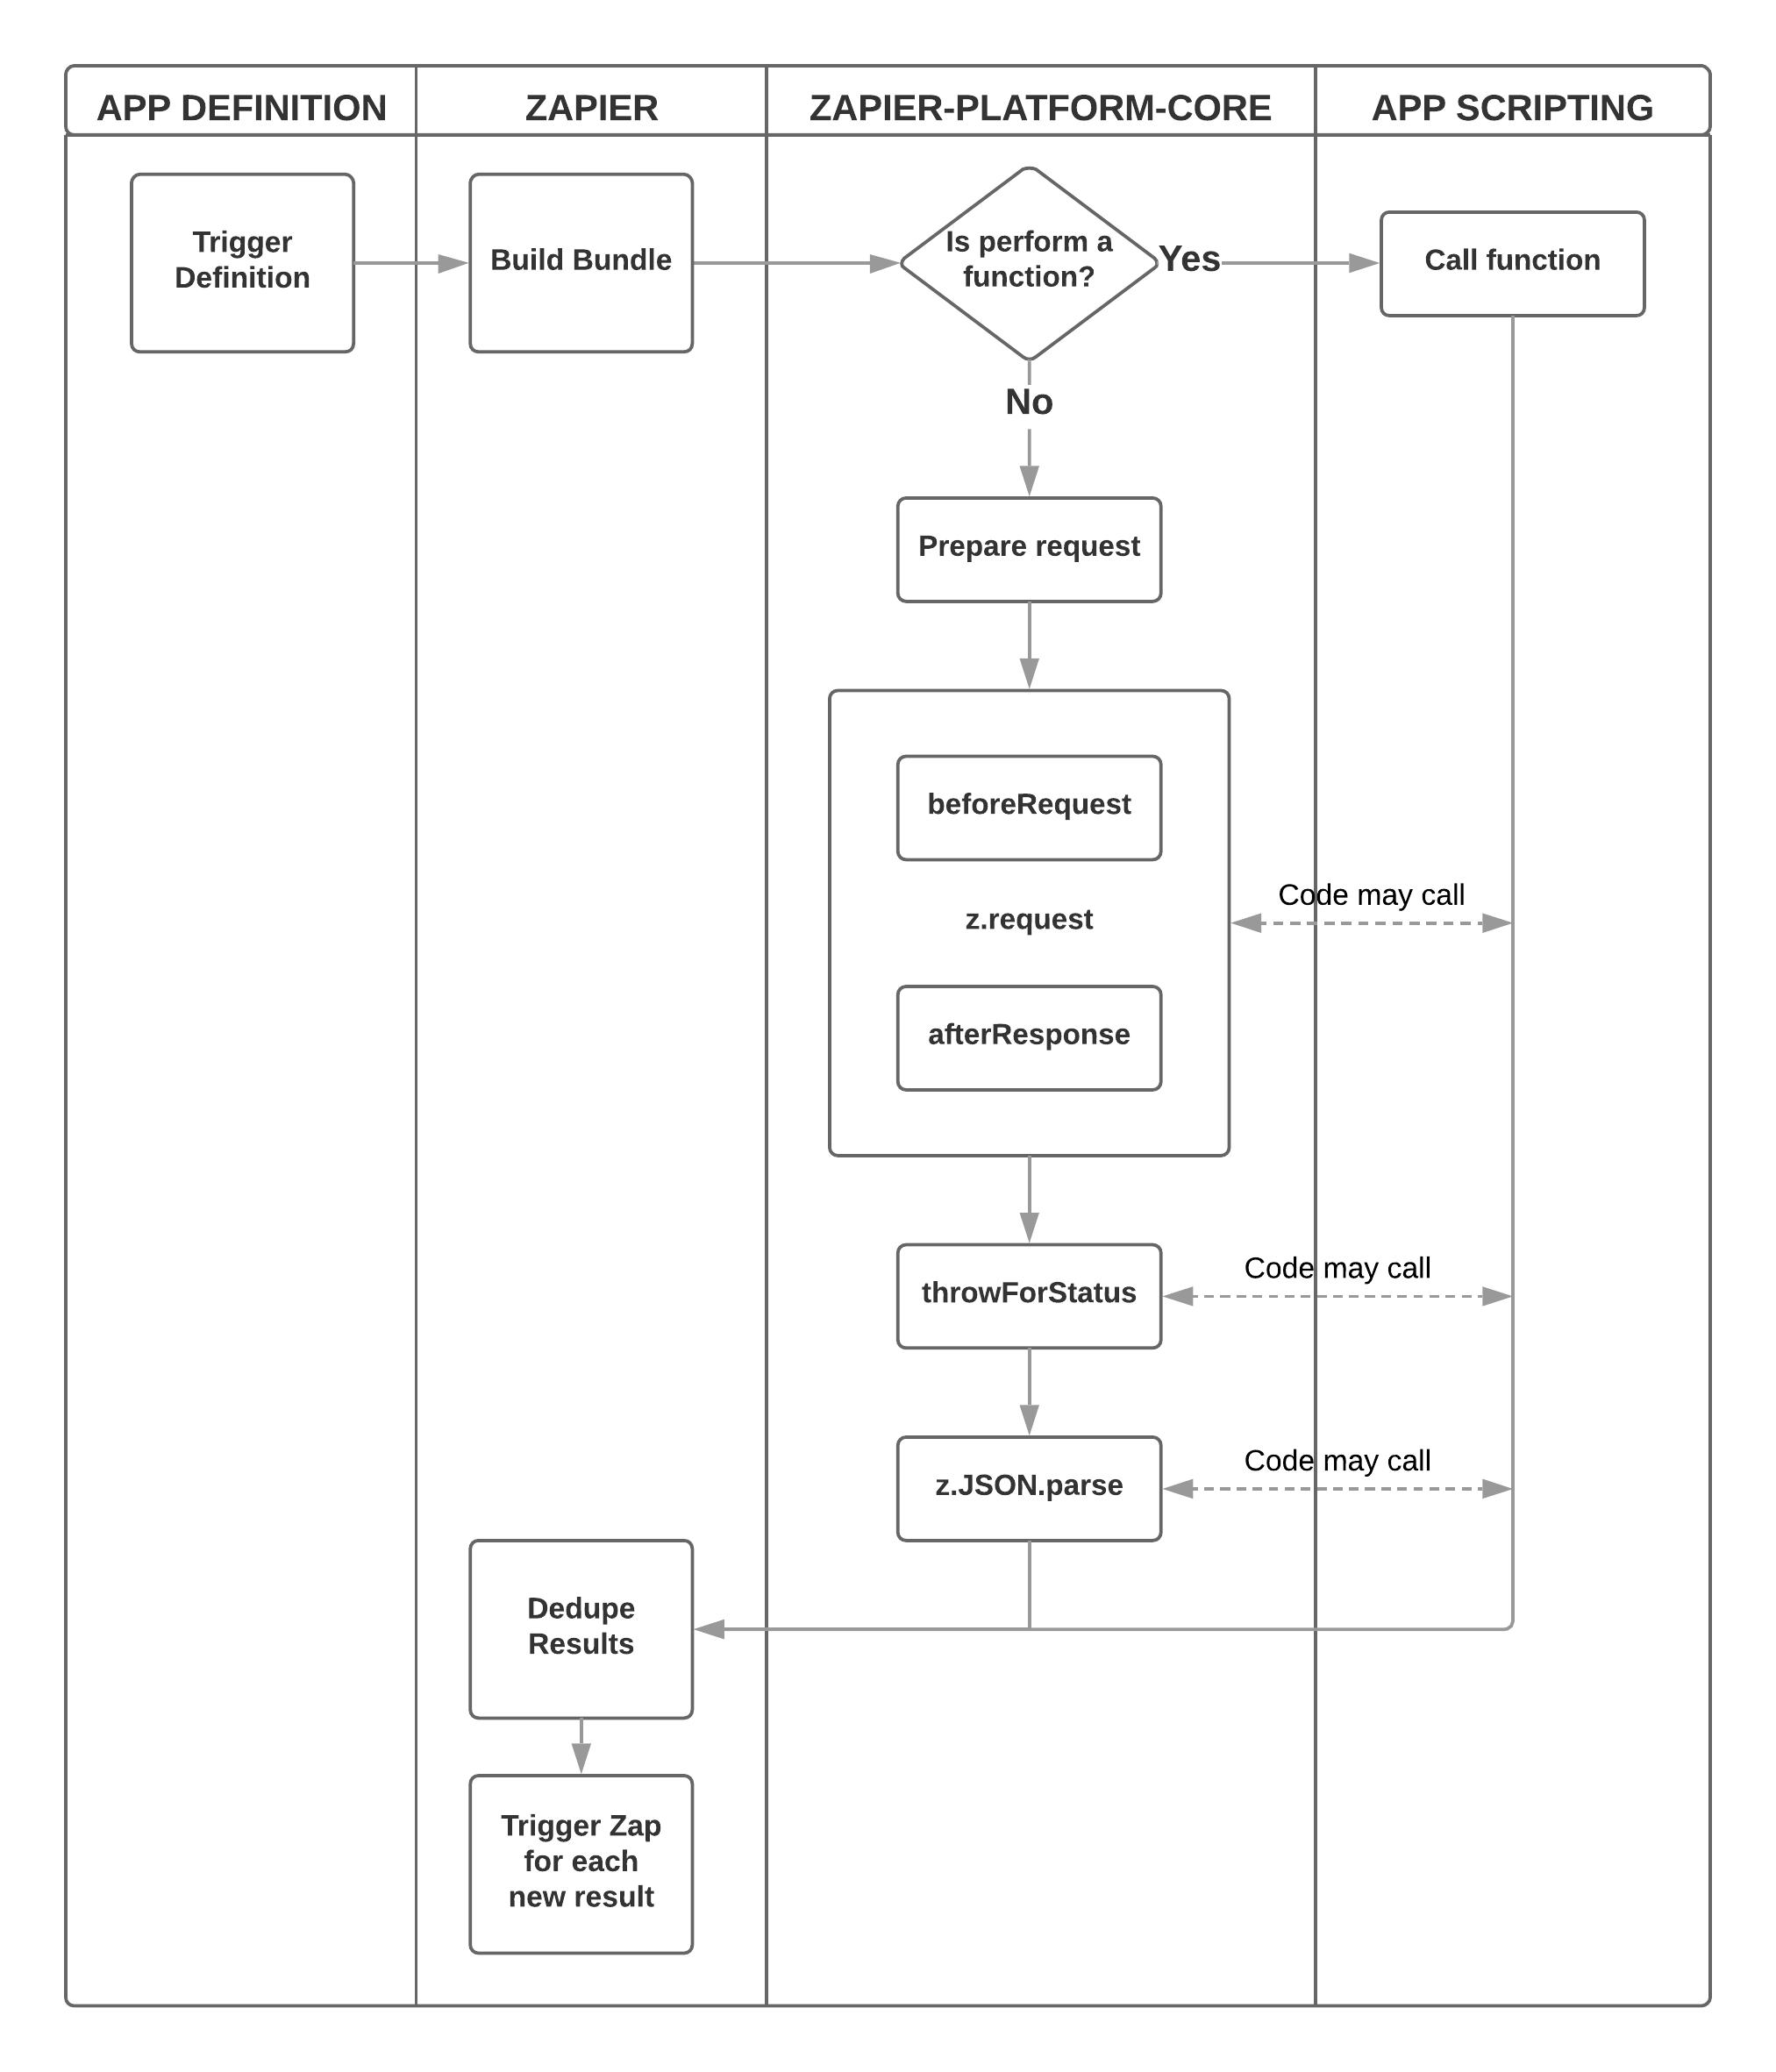 Zapier Platform Diagram